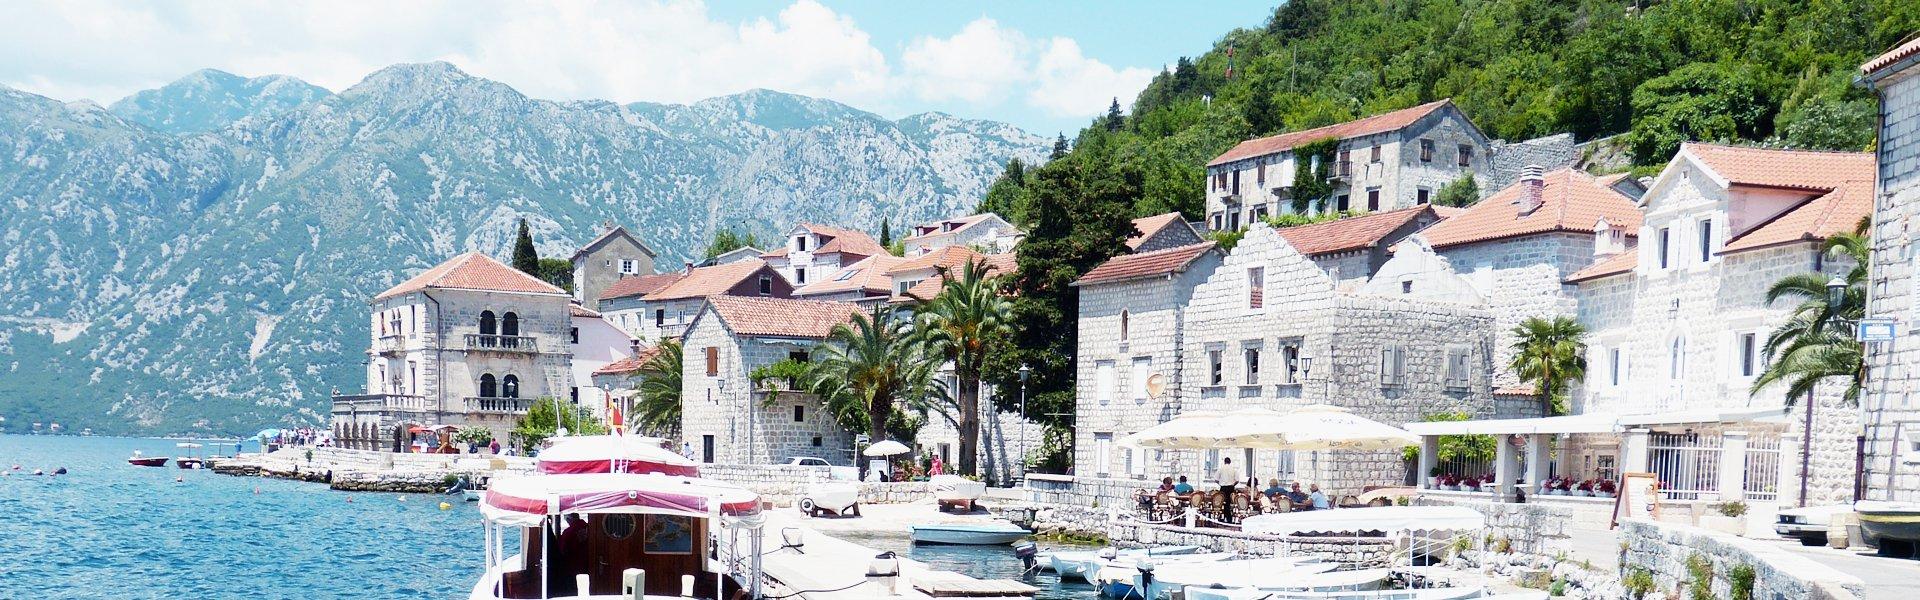 Kotor in Montenegro